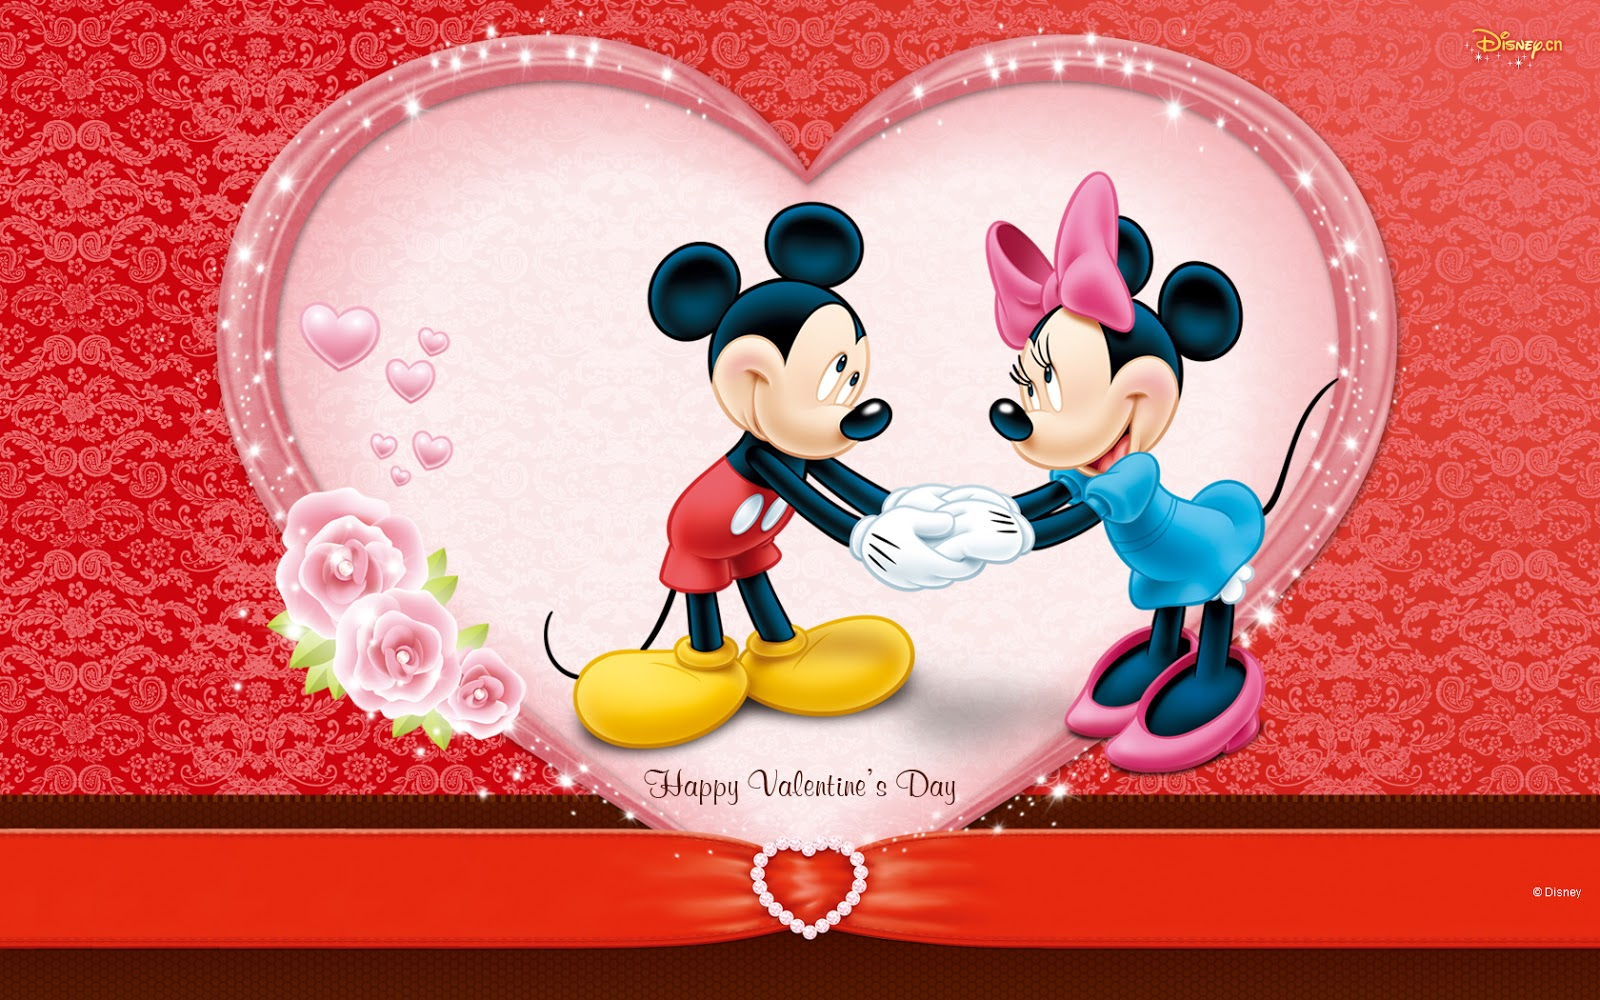 2013 Valentine Card, E-Cards 2013: Top 10 Valentine's Day ...